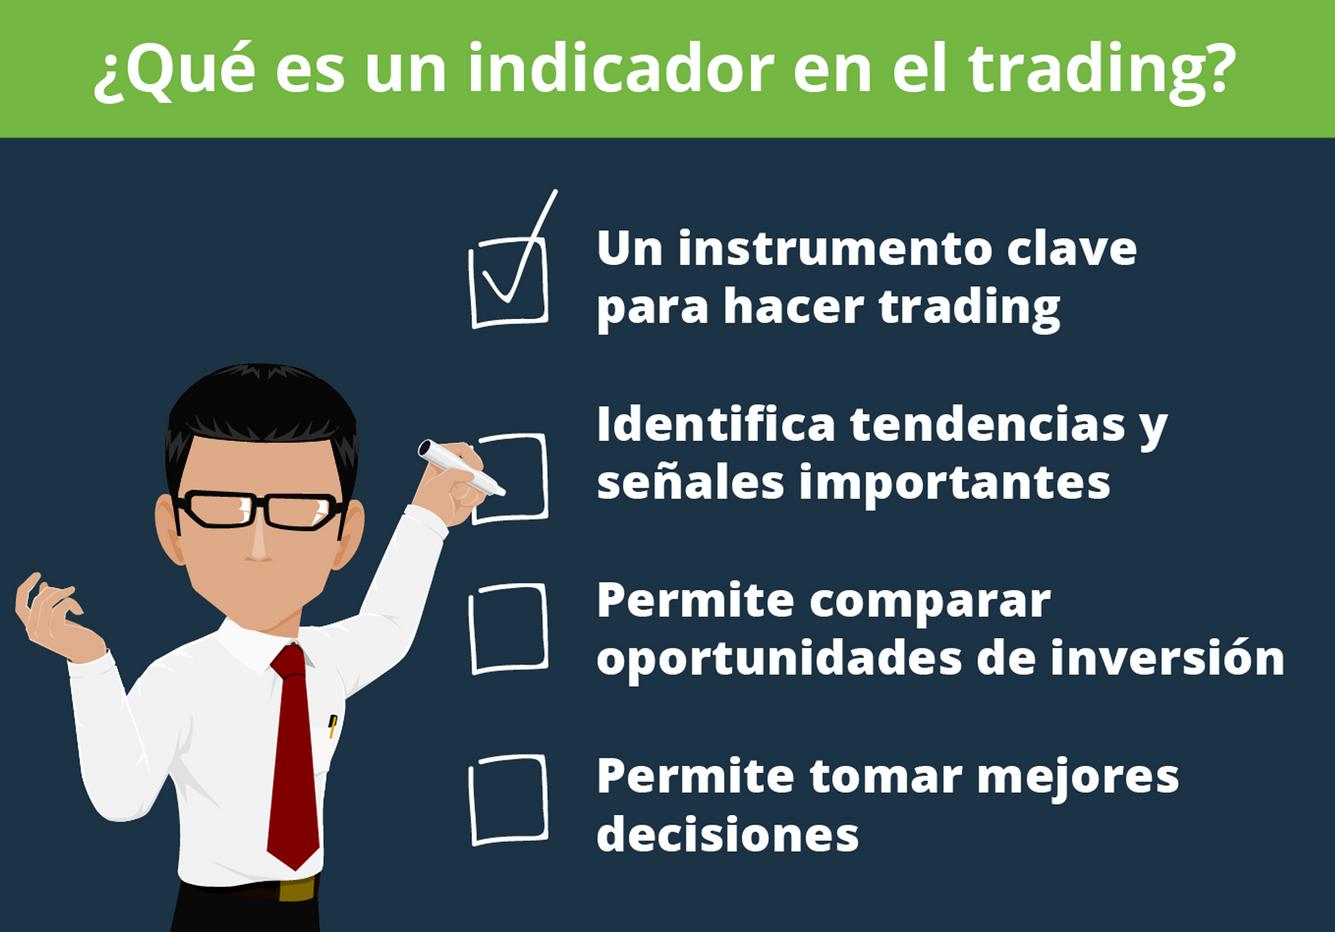 Infographic - Finance